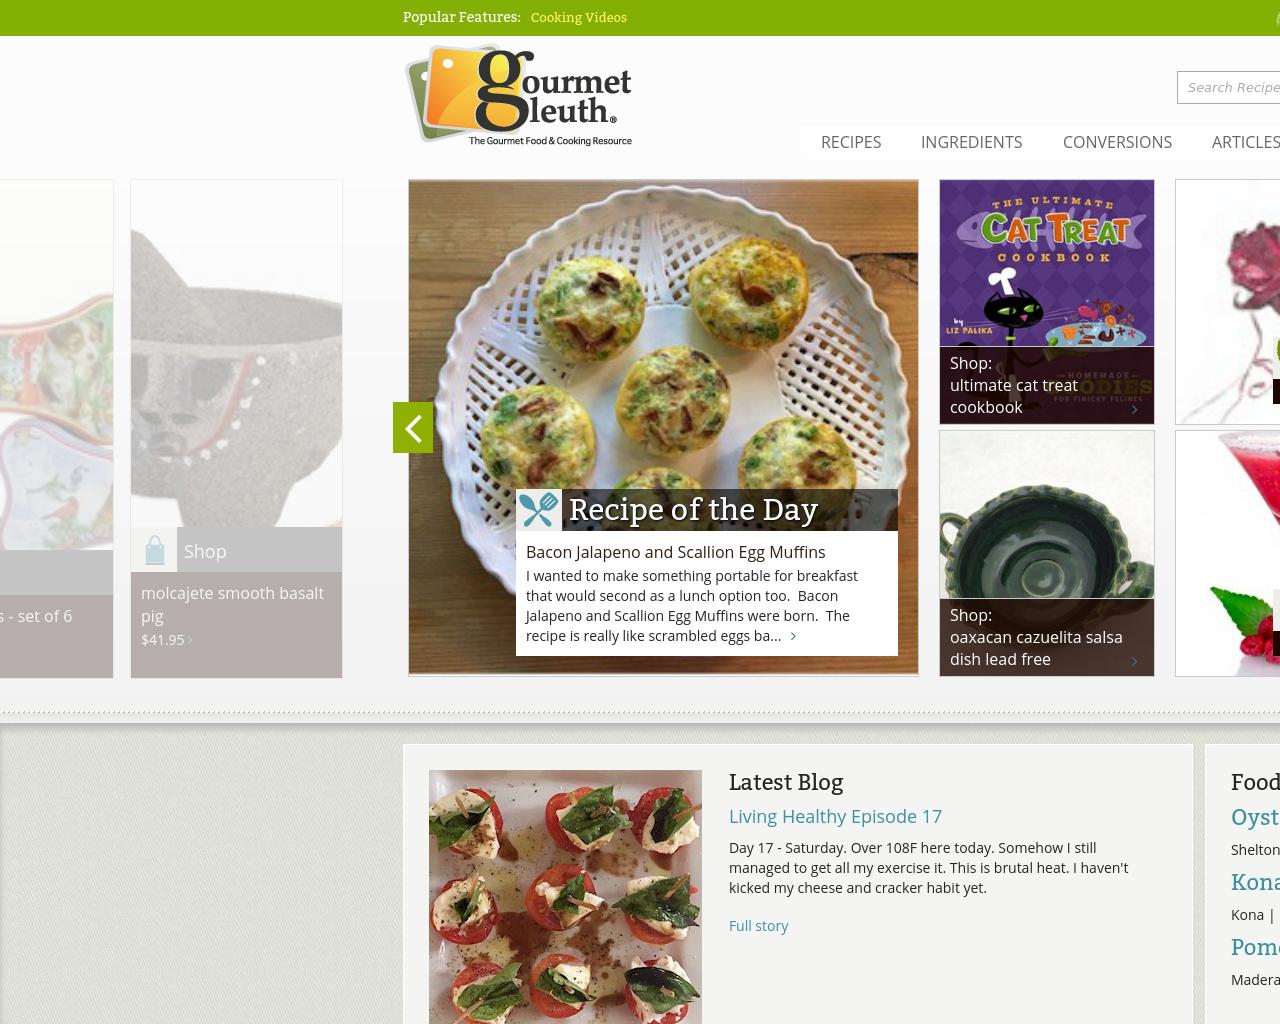 GourmetSleuth-Advertising-Reviews-Pricing